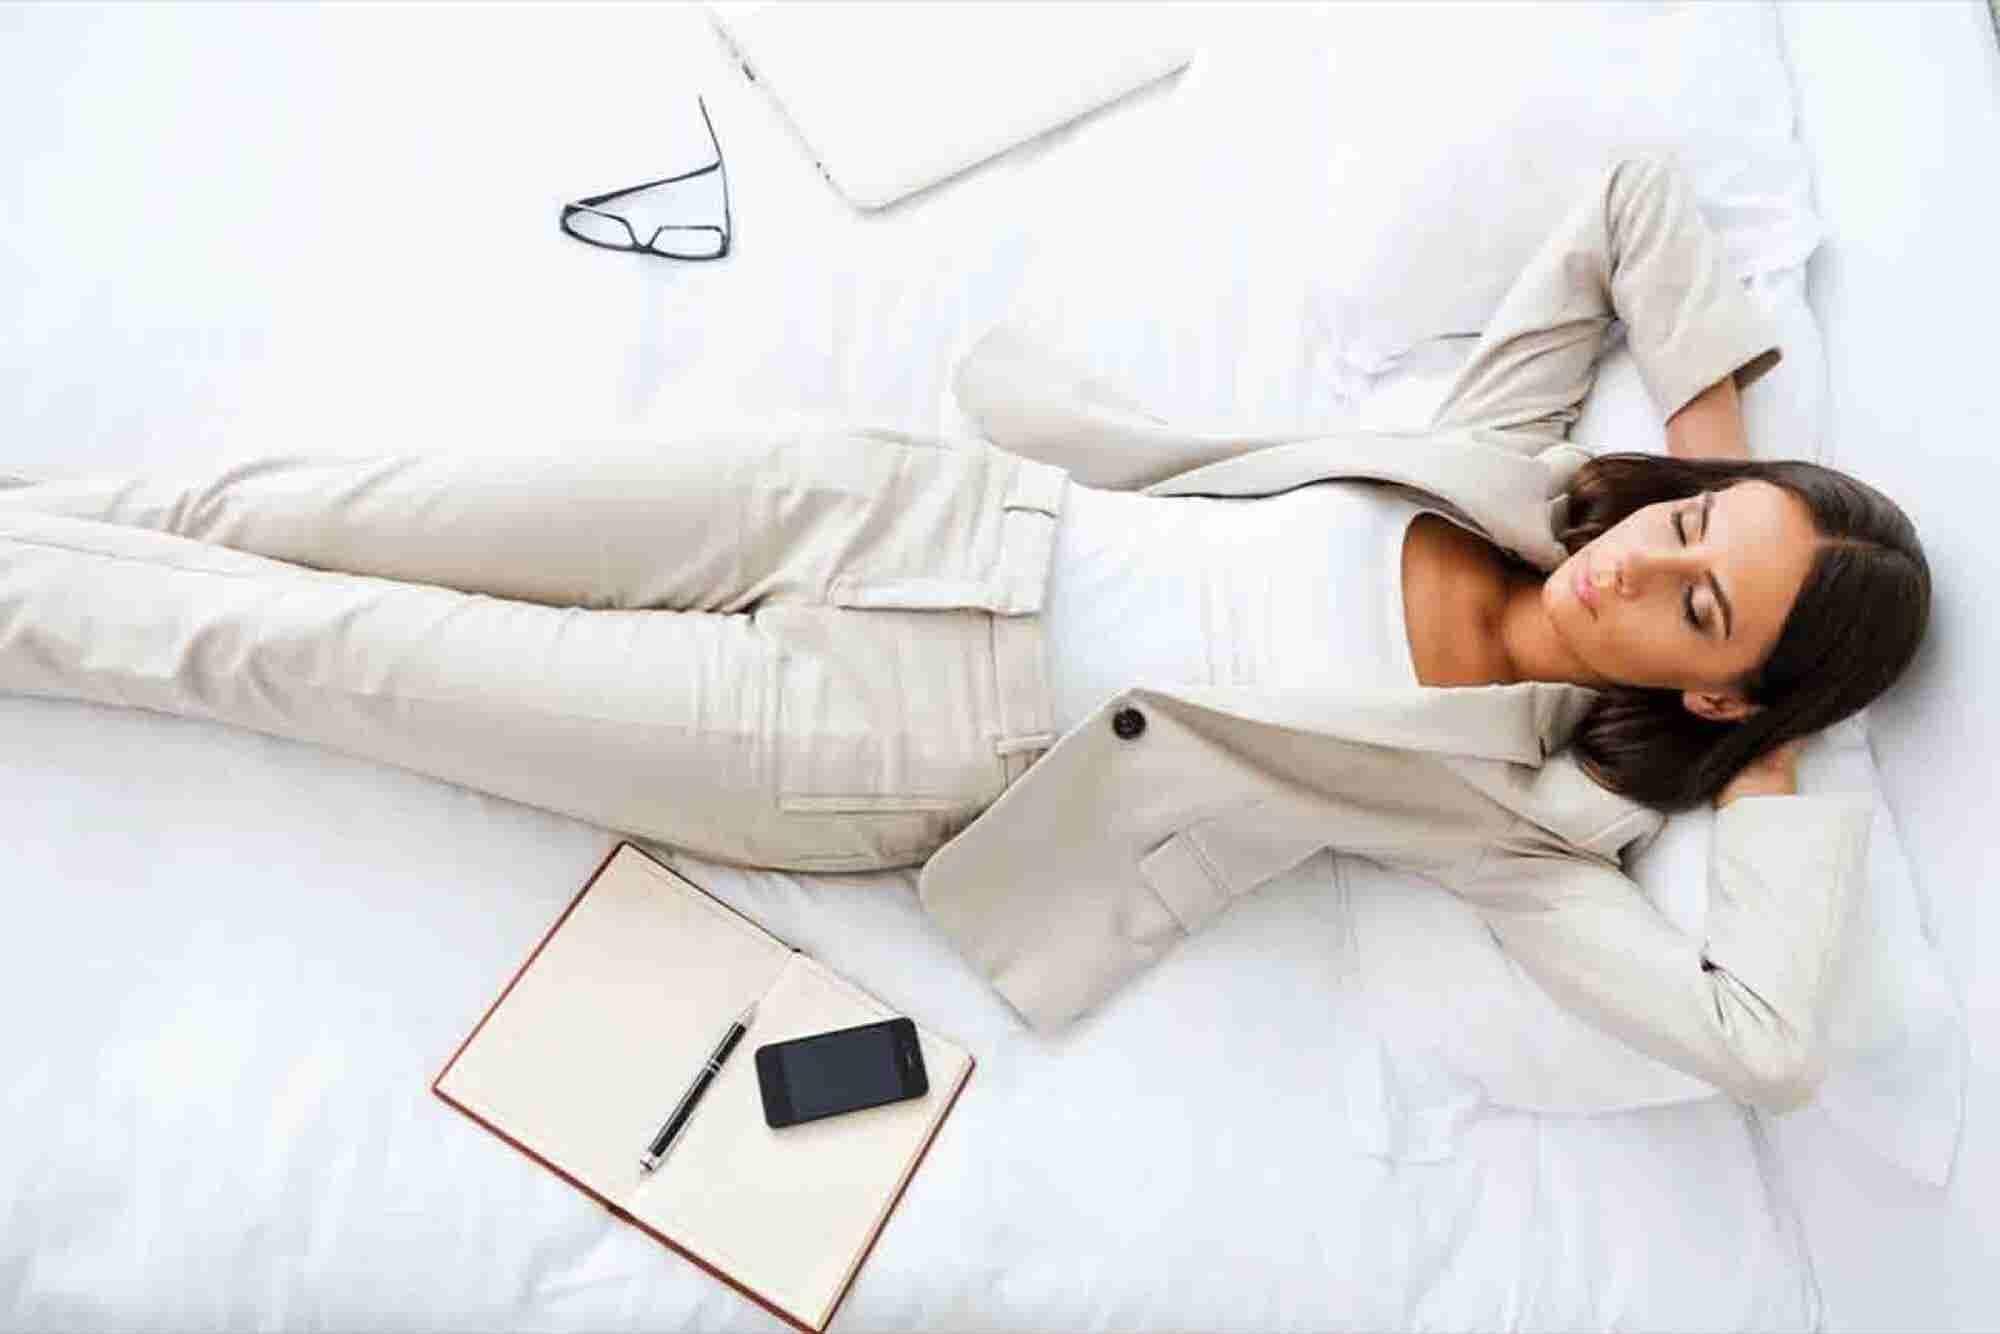 The 10 Commandments for a Lazy Entrepreneur